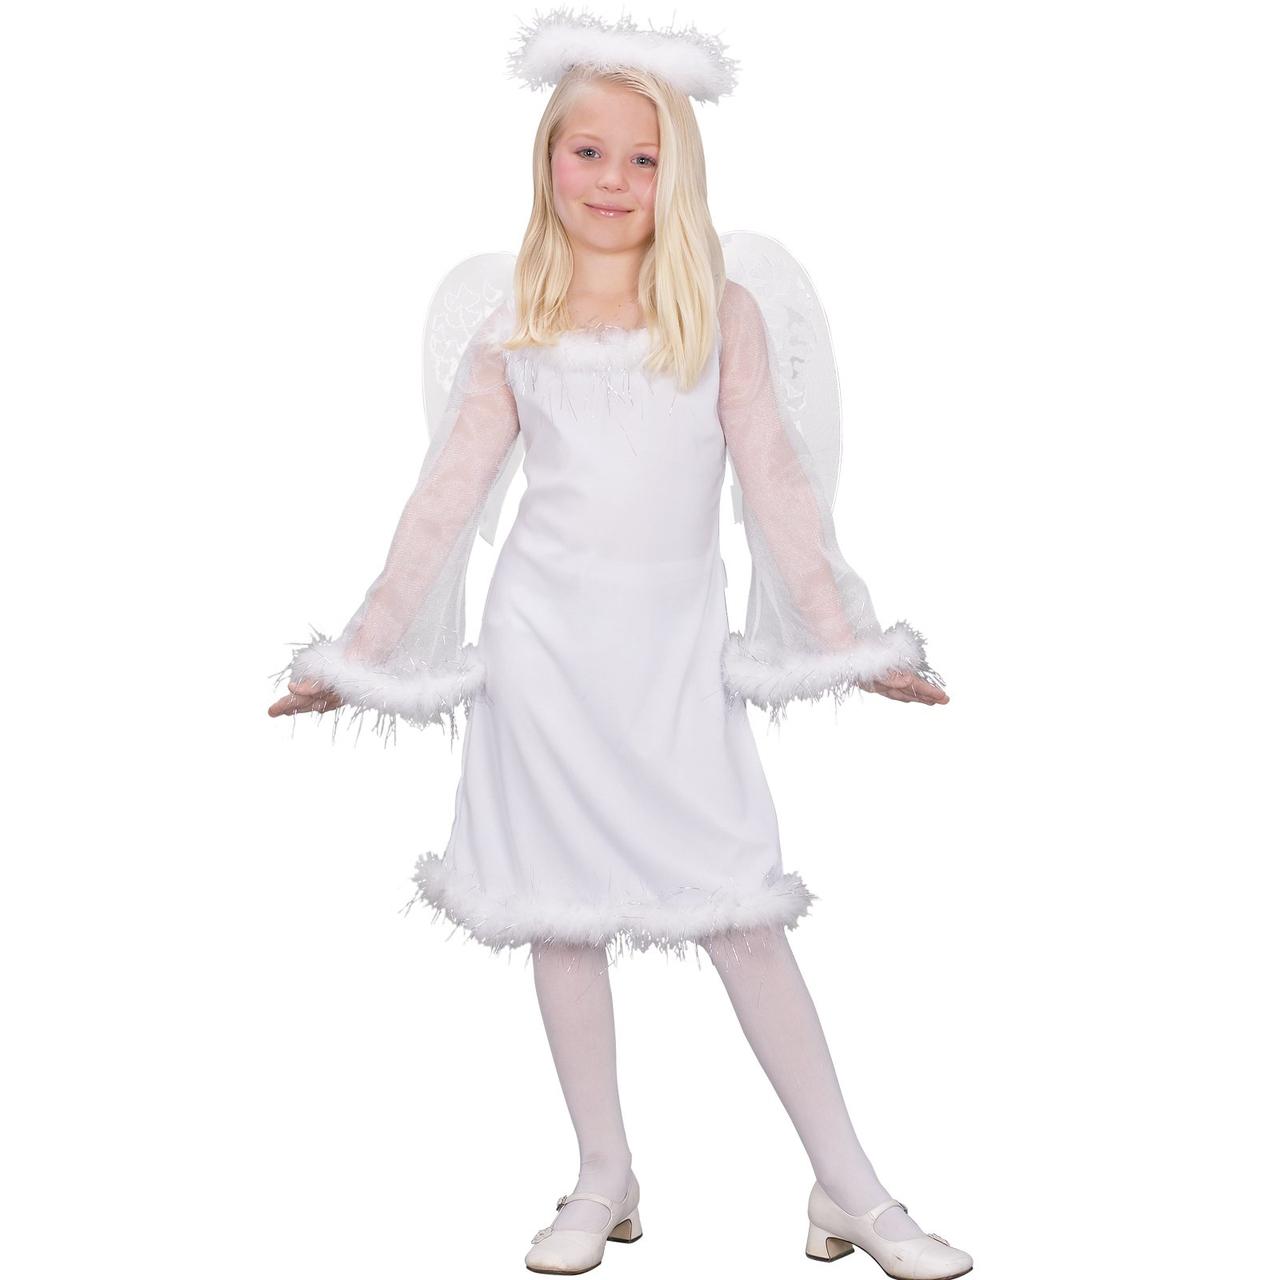 Fallen Angel Costume | CostumesFC.com